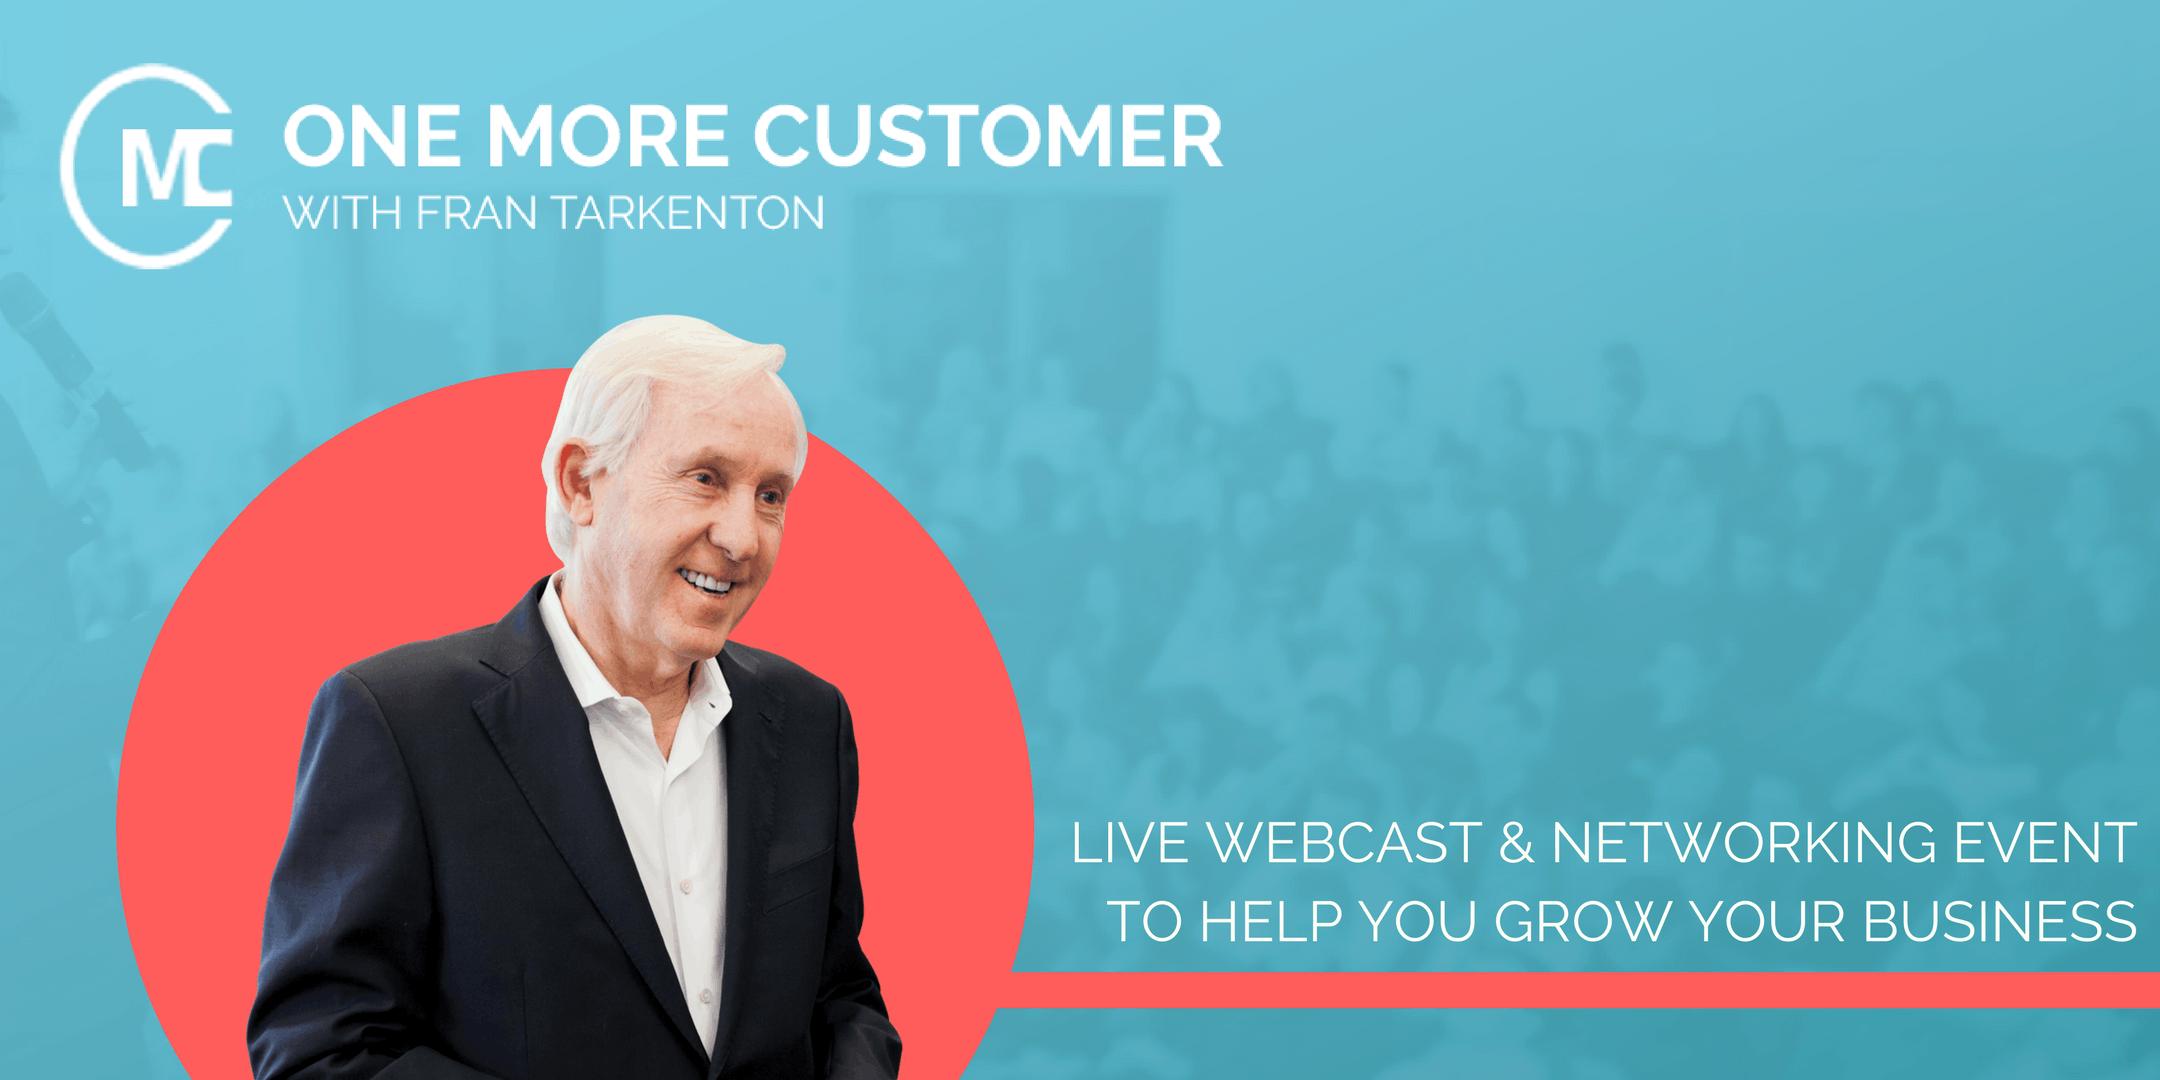 One More Customer - Free Coaching & Networkin